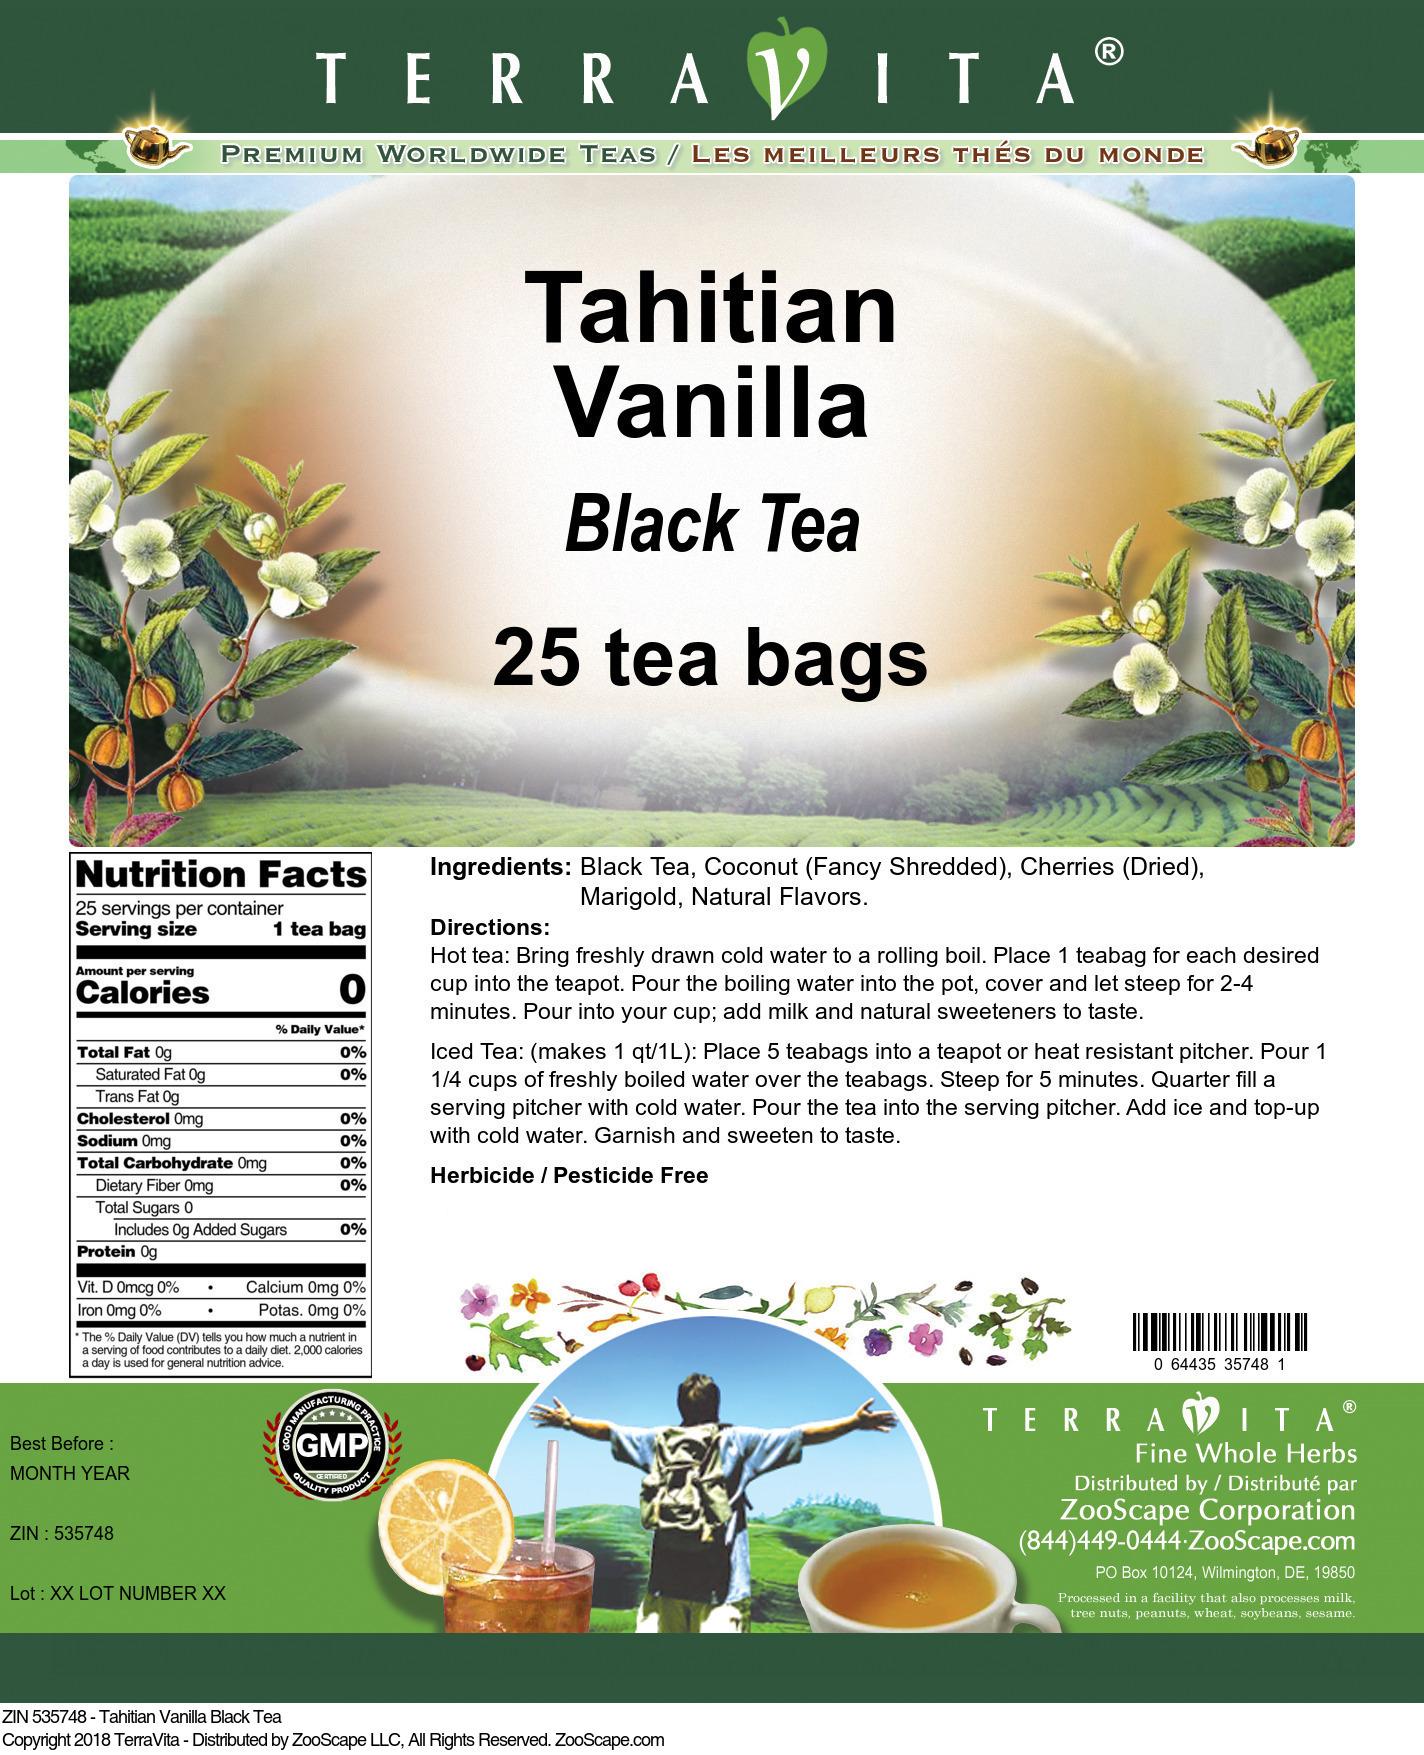 Tahitian Vanilla Black Tea